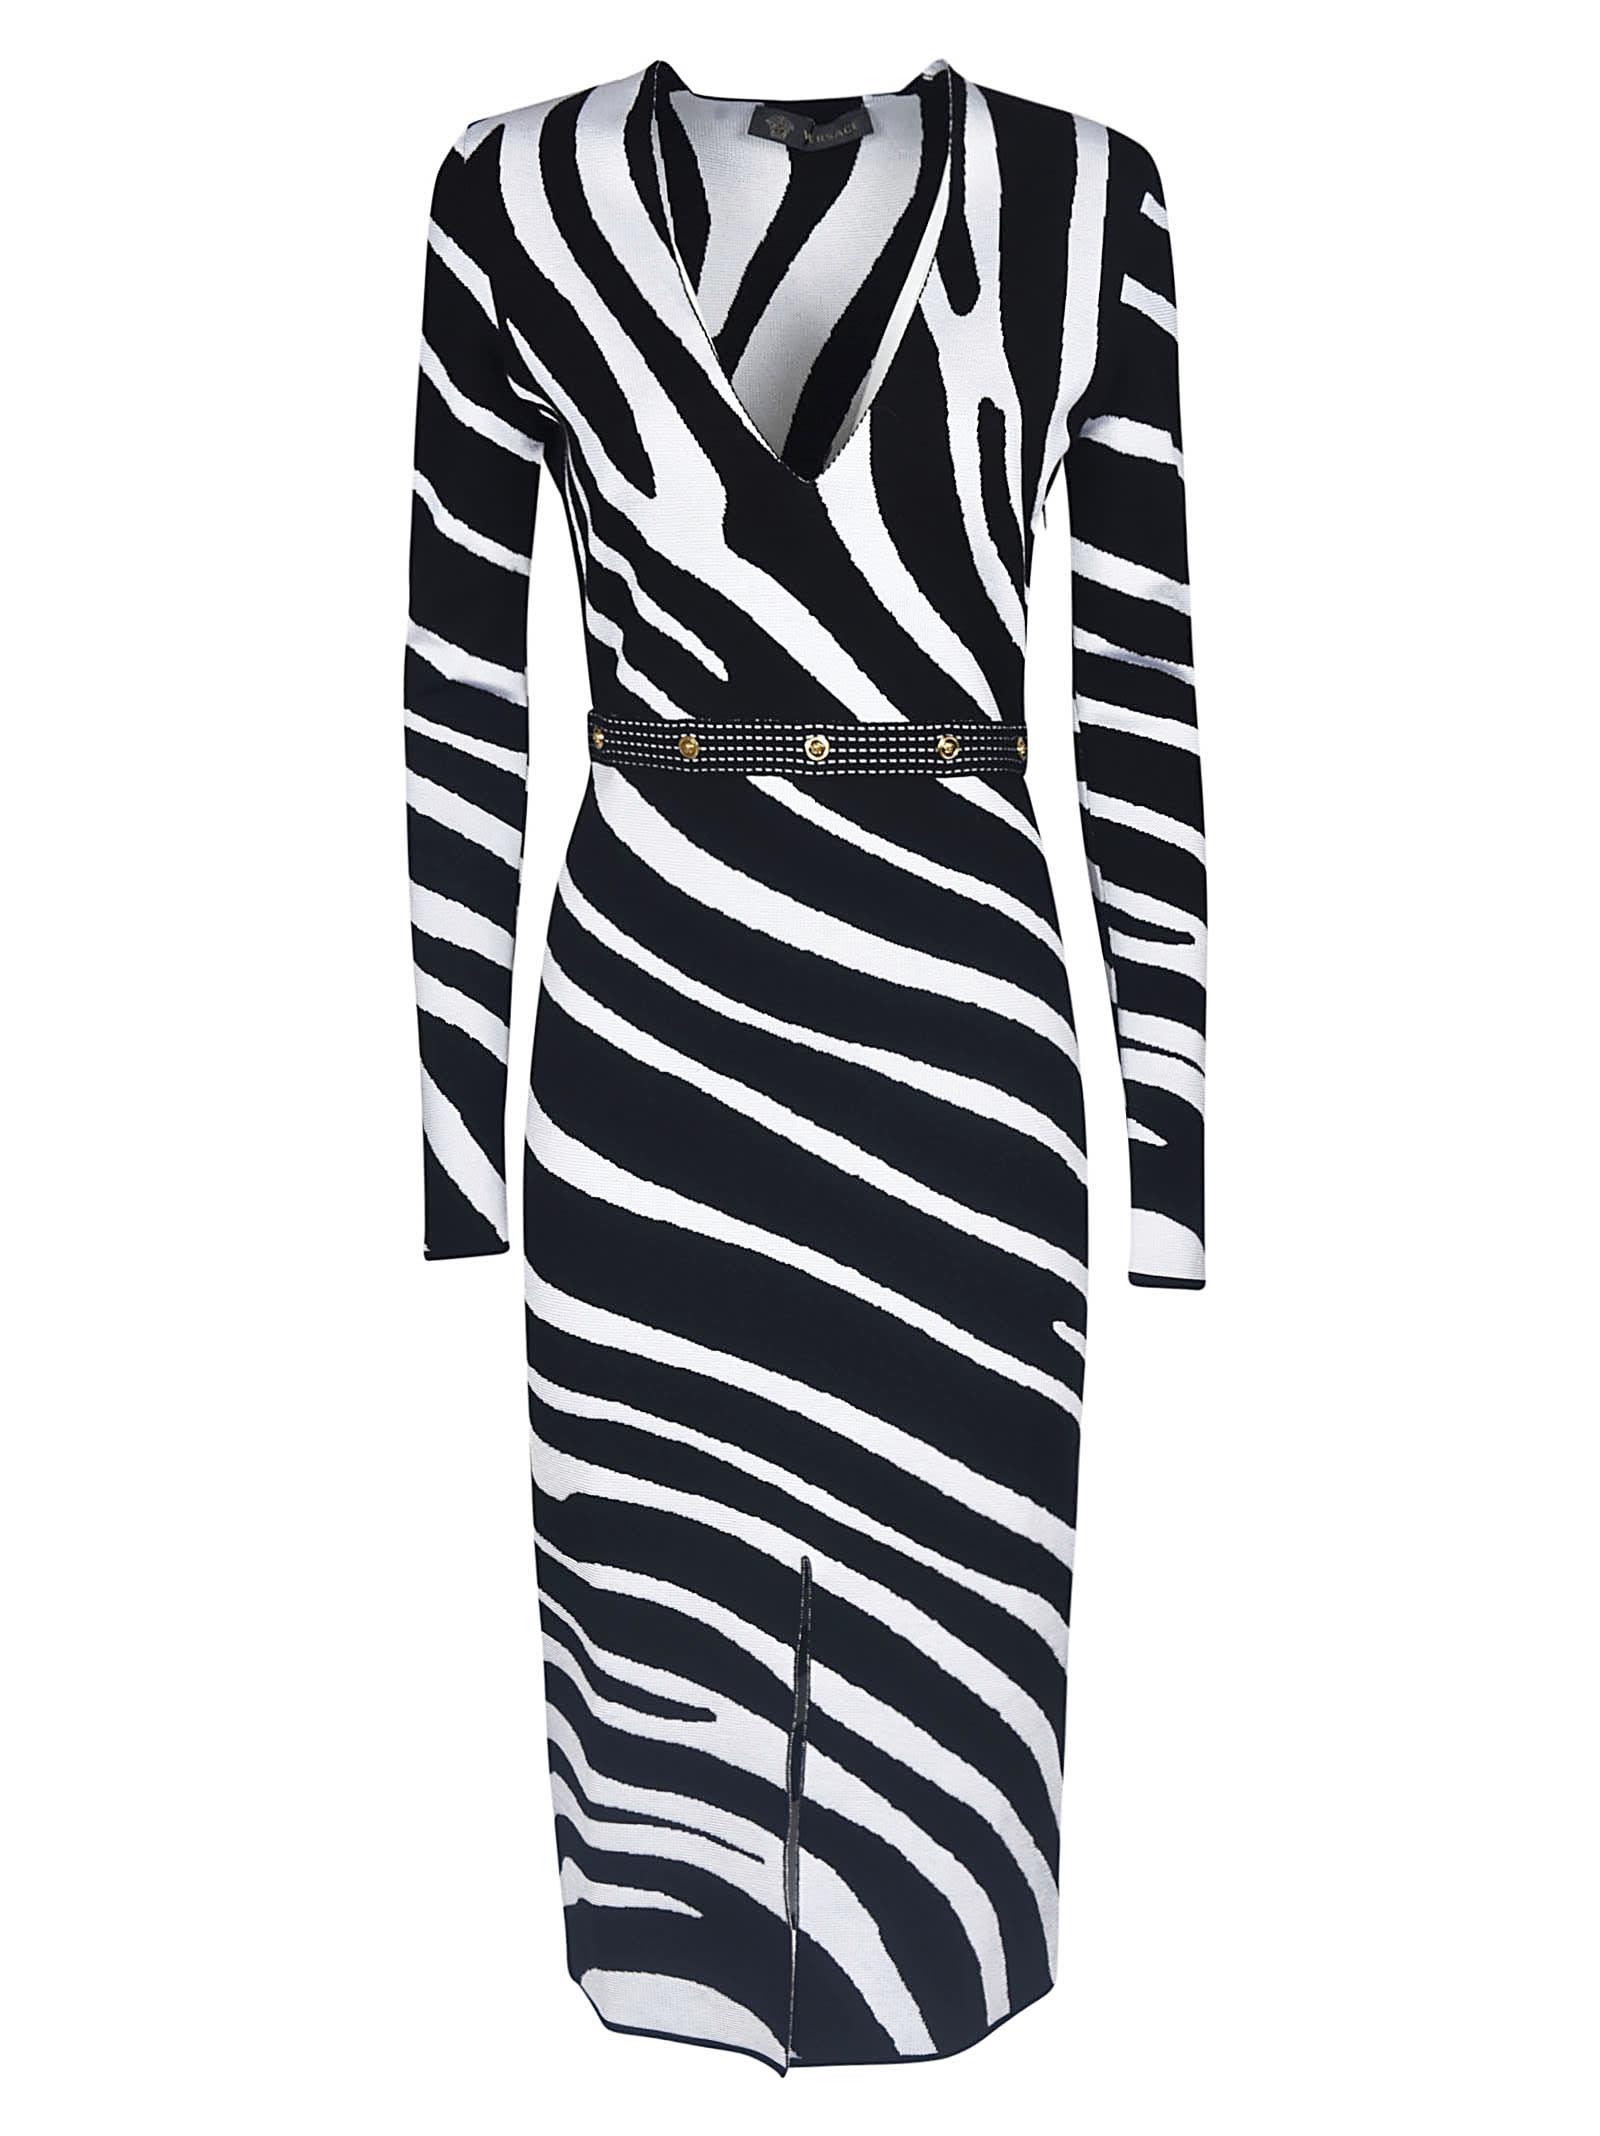 Versace Zebra Printed Dress